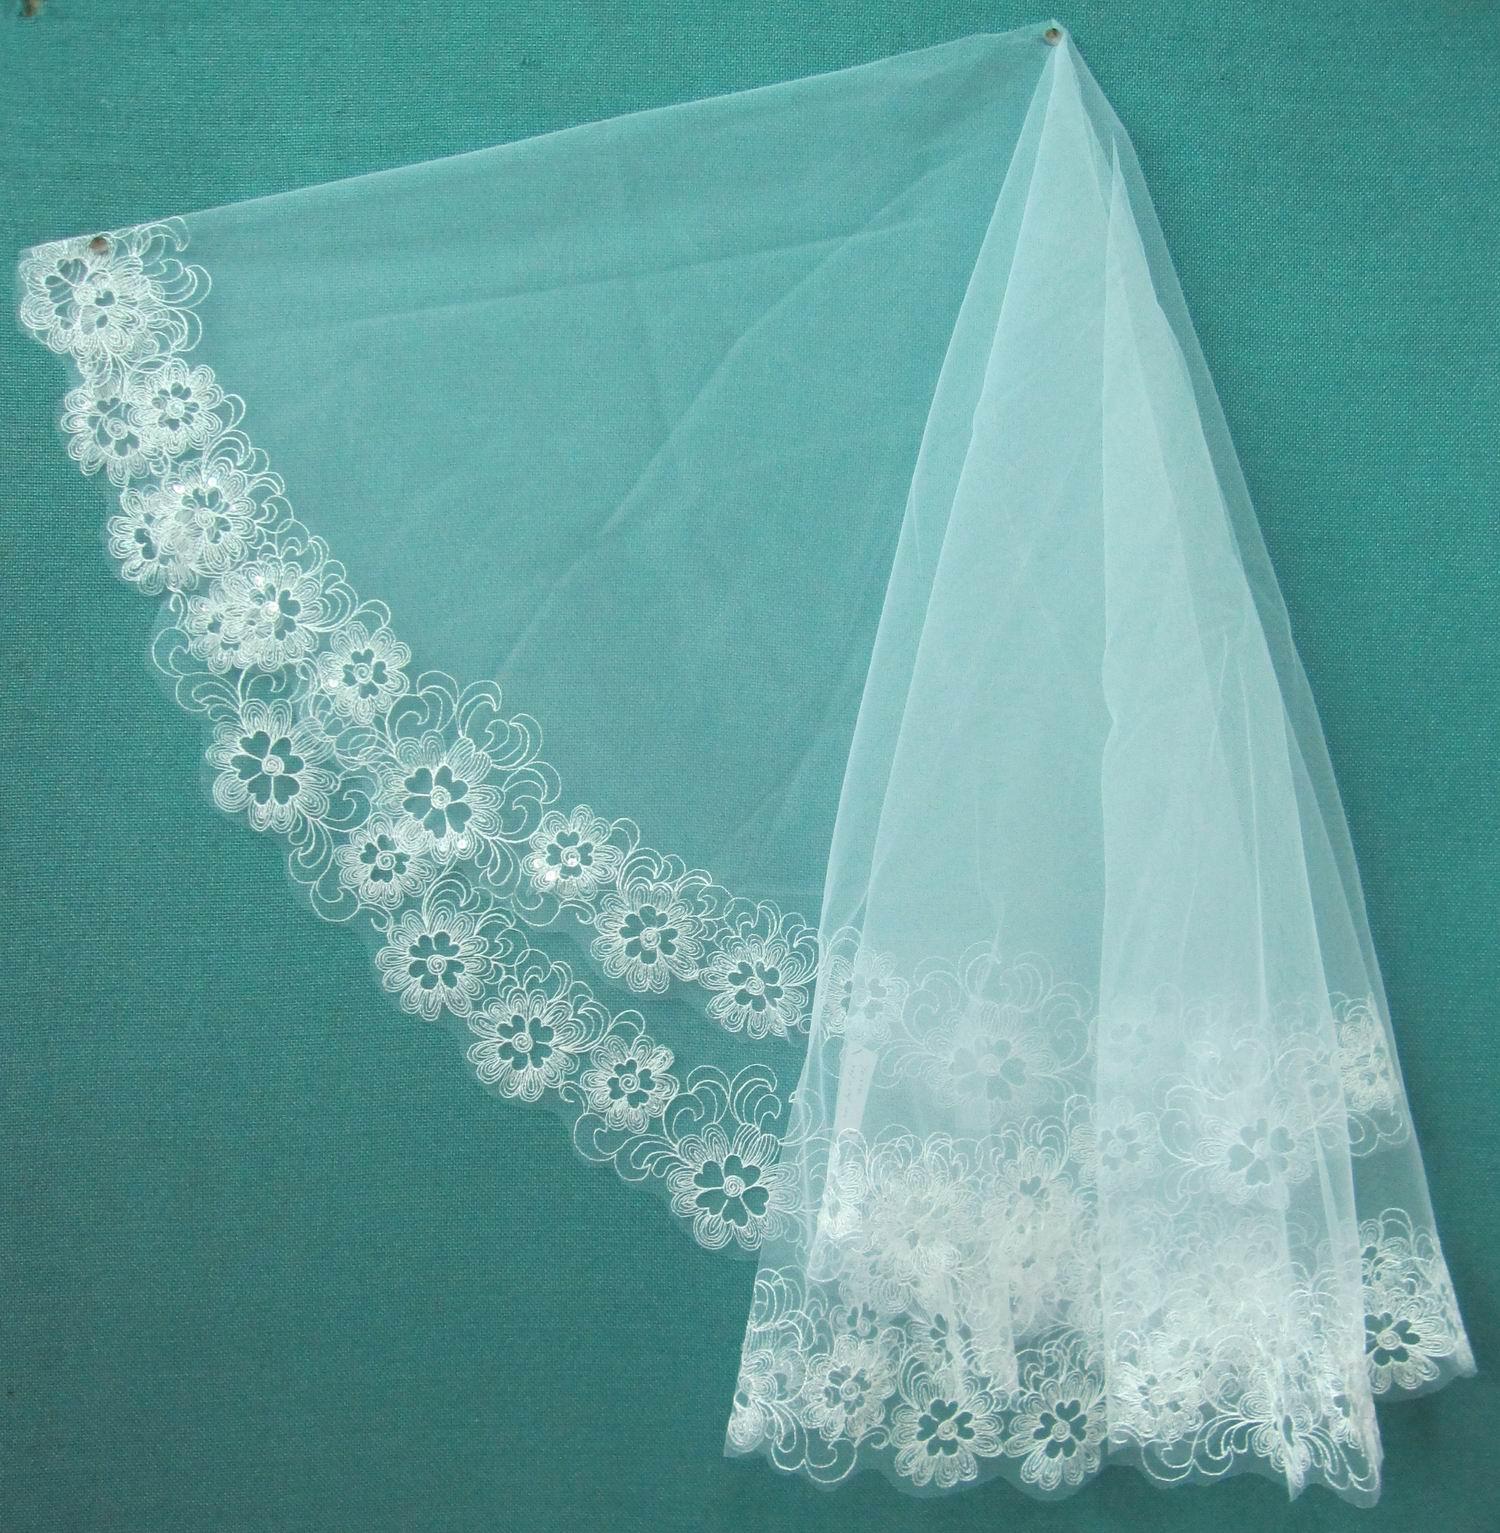 1066925f3 مصنع الجملة اكسسوارات الزفاف مخصص زهرة مانتيا العروس كاتدرائية الزفاف الحجاب